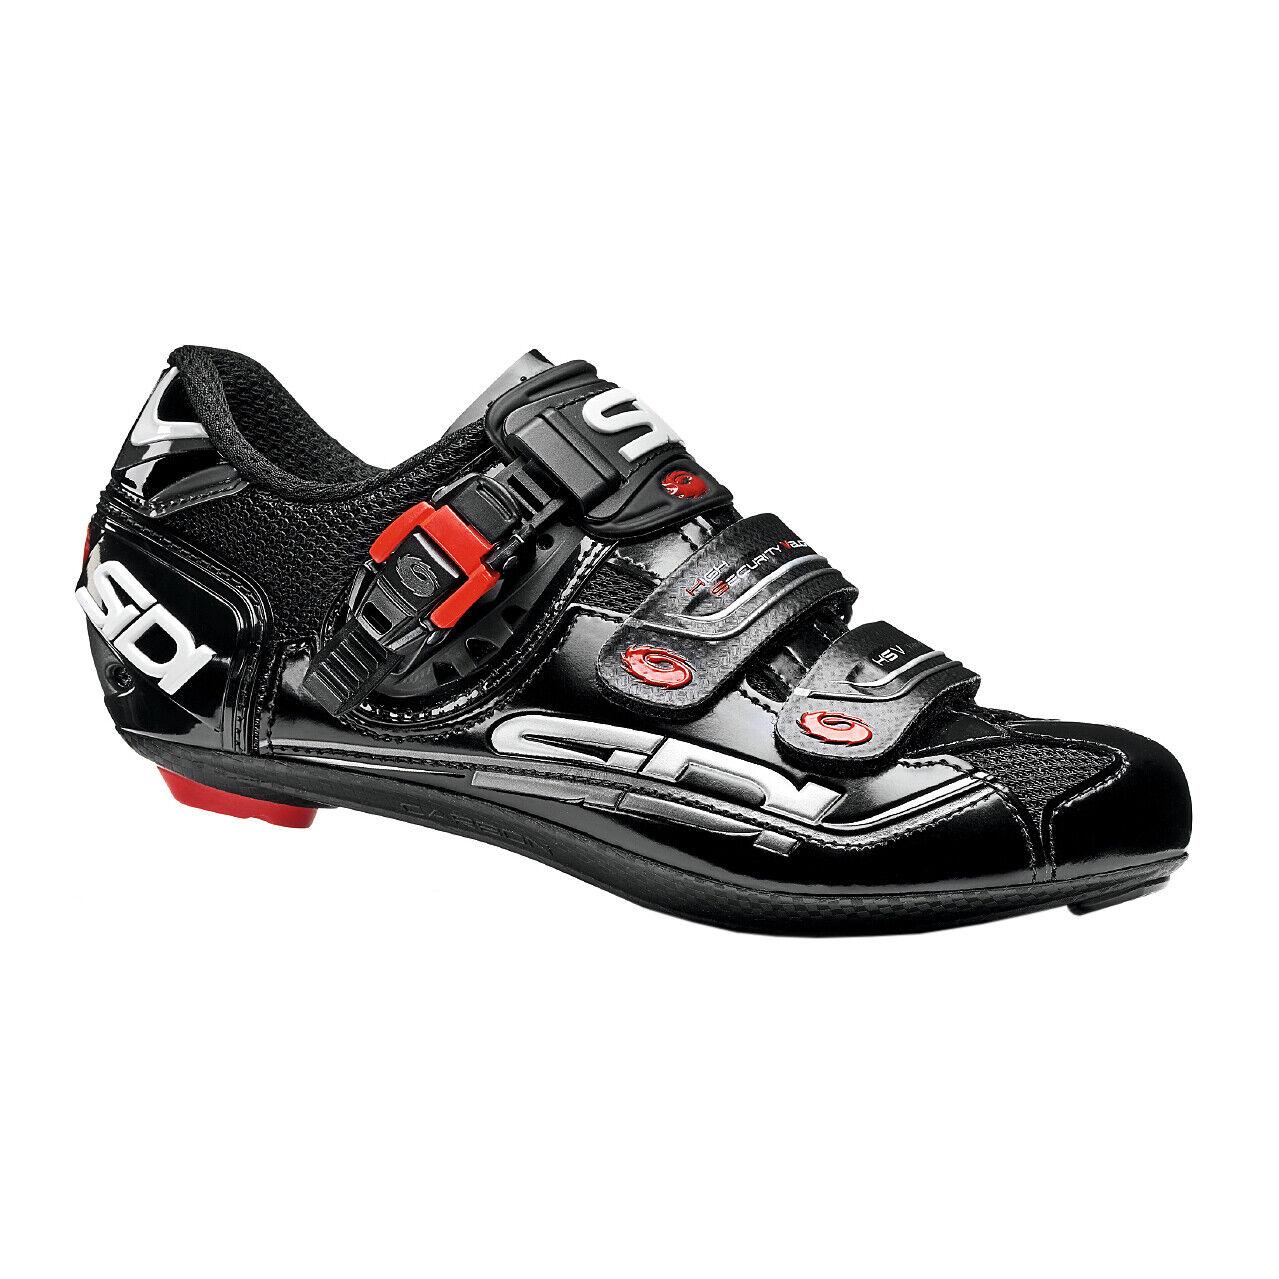 Sidi Wouomo Genius 7 Cycling scarpe